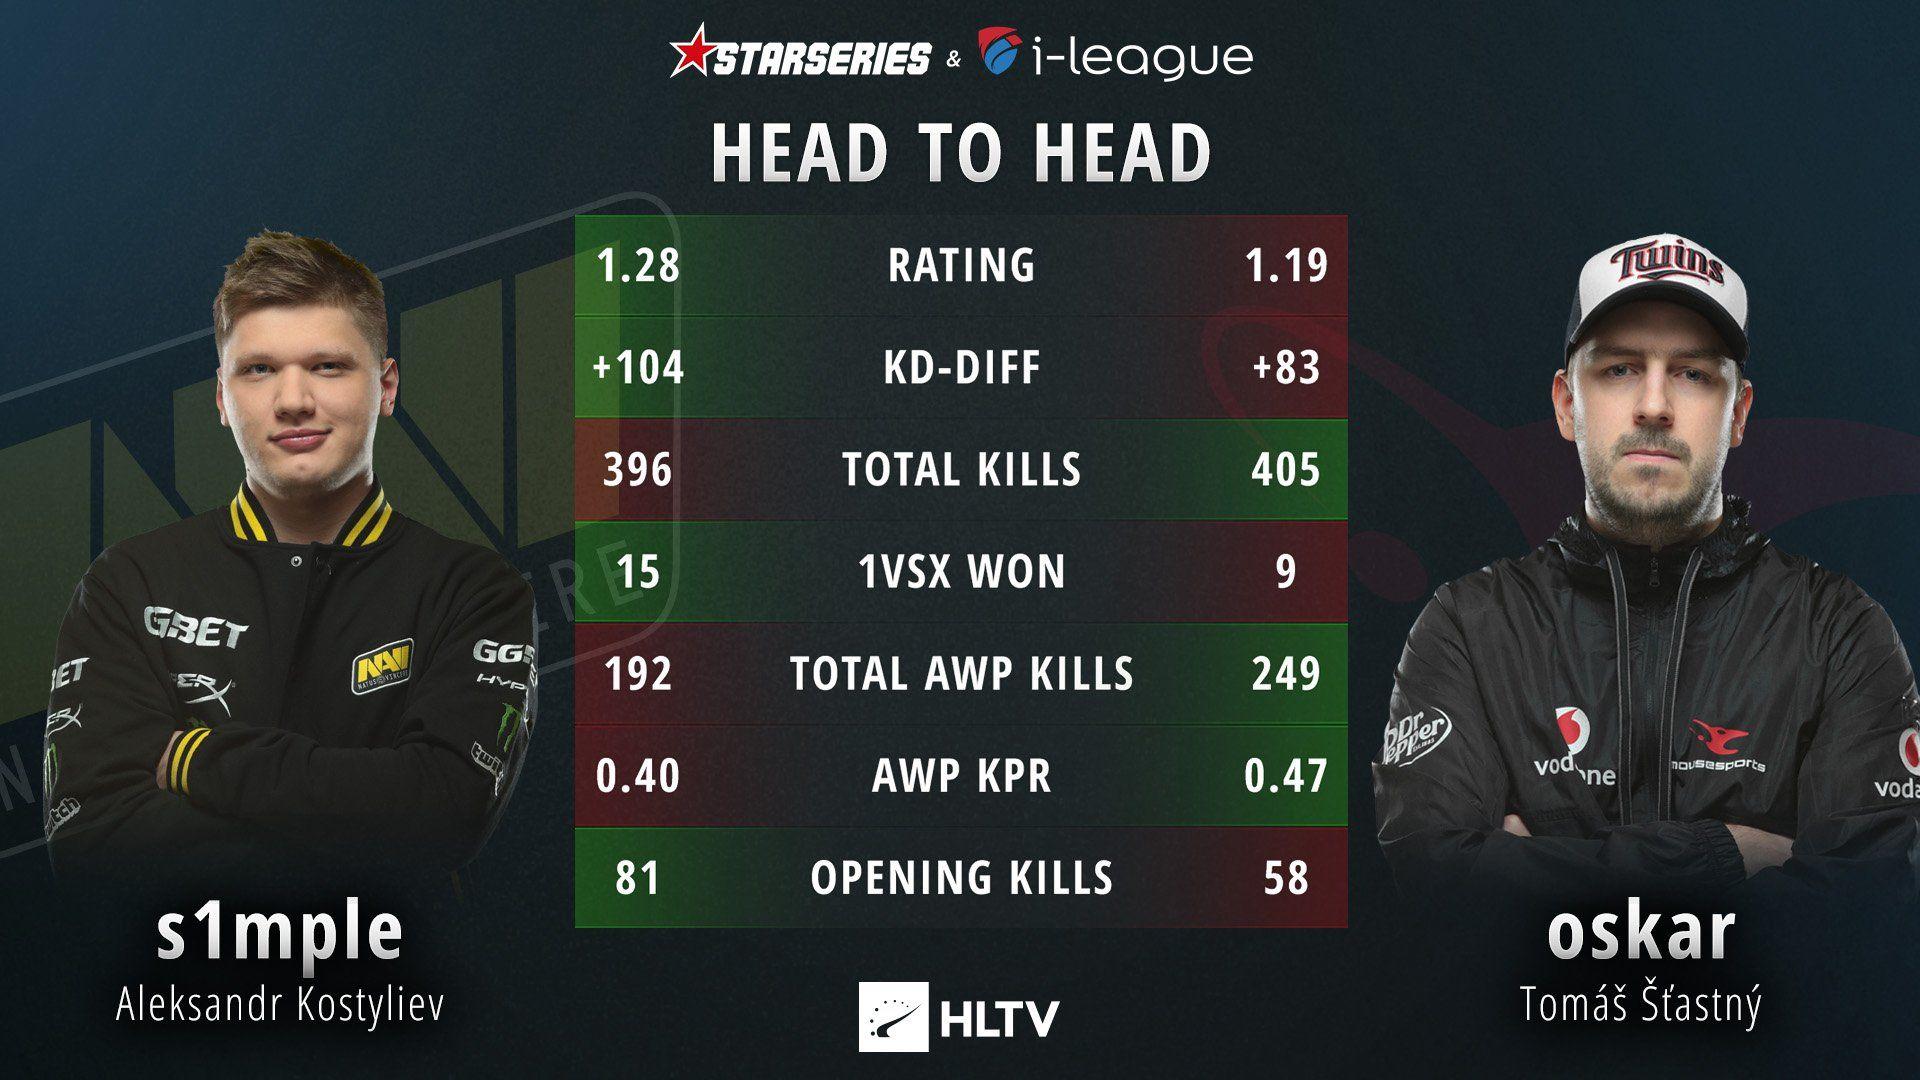 s1mple vs Oskar SLTV stats #games #globaloffensive #CSGO